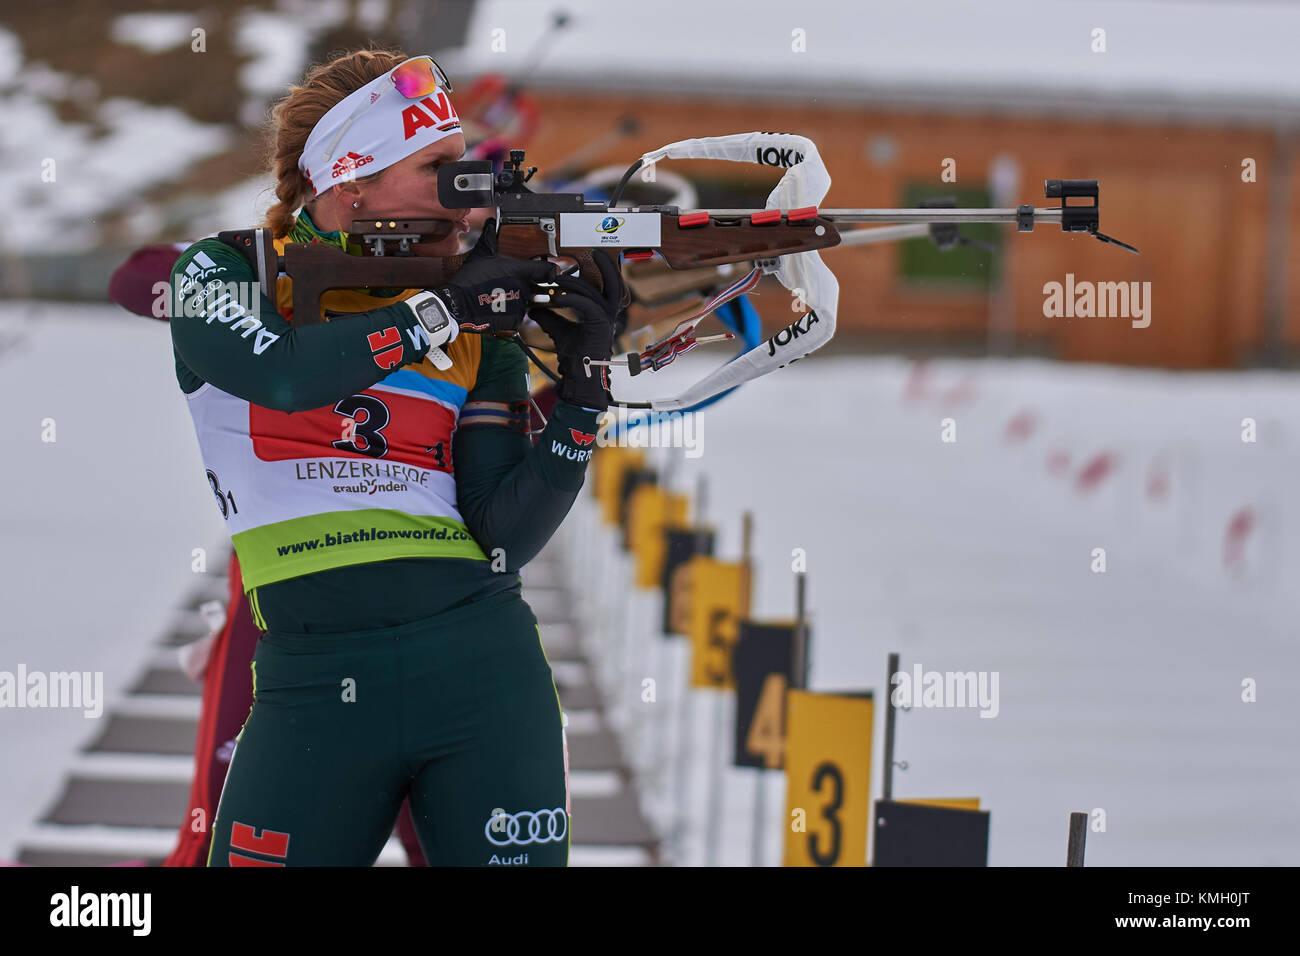 Lenzerheide, Switzerland. 8th Dec, 2017. HORCHLER Nadine (GER) during the IBU Biathlon Cup Mixed Relay in Lenzerheide. - Stock Image